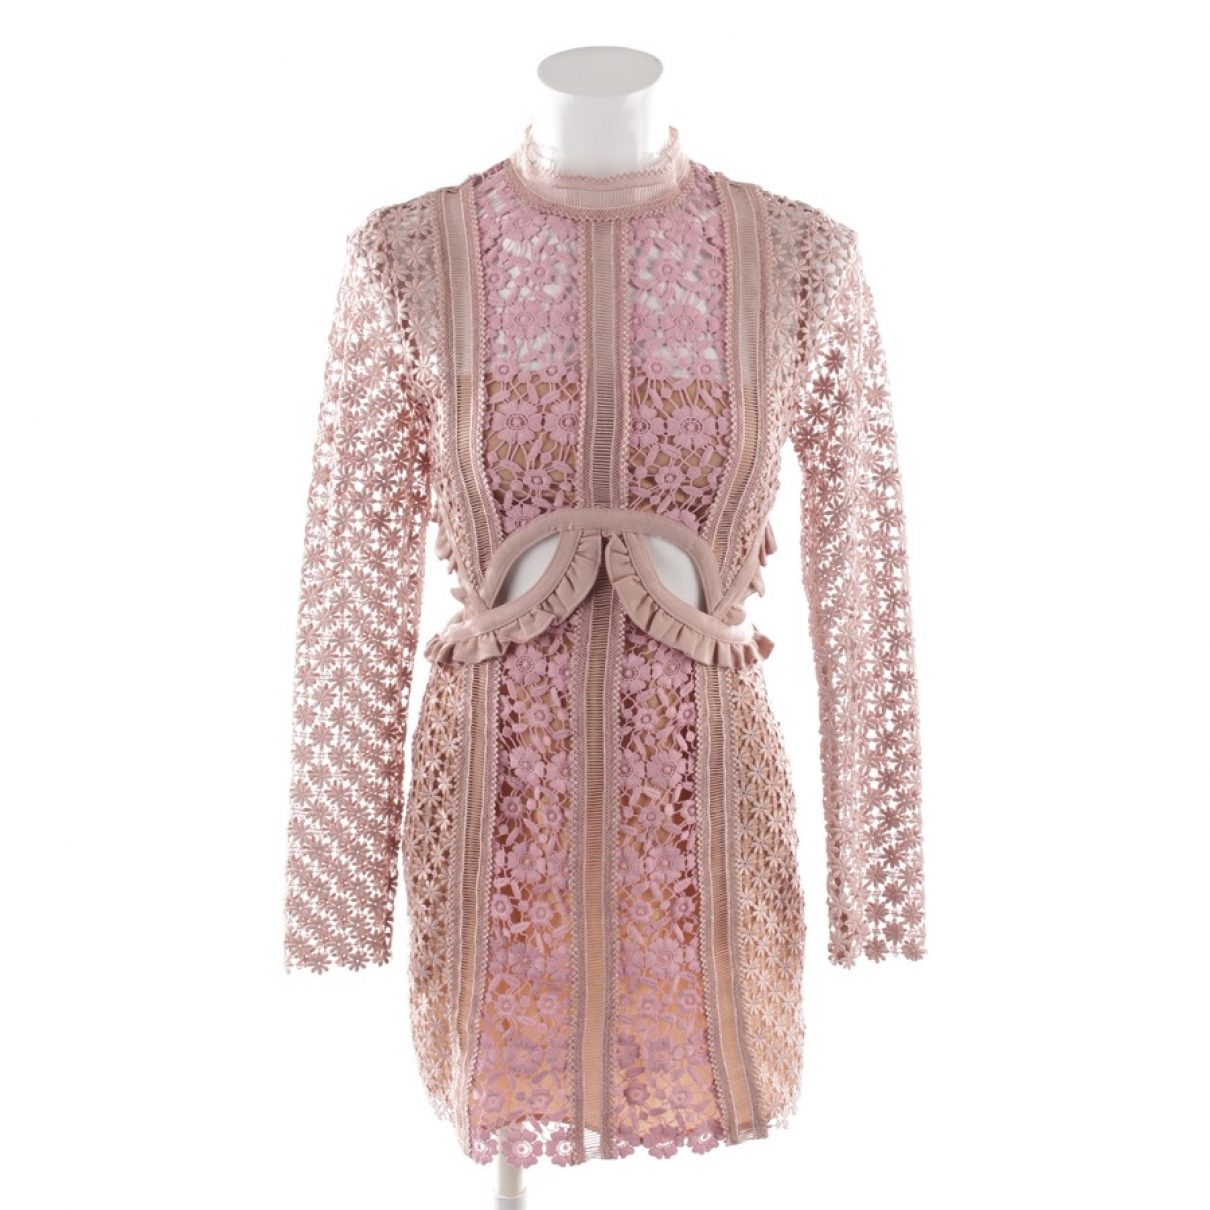 Self Portrait \N Pink Lace dress for Women 34 FR